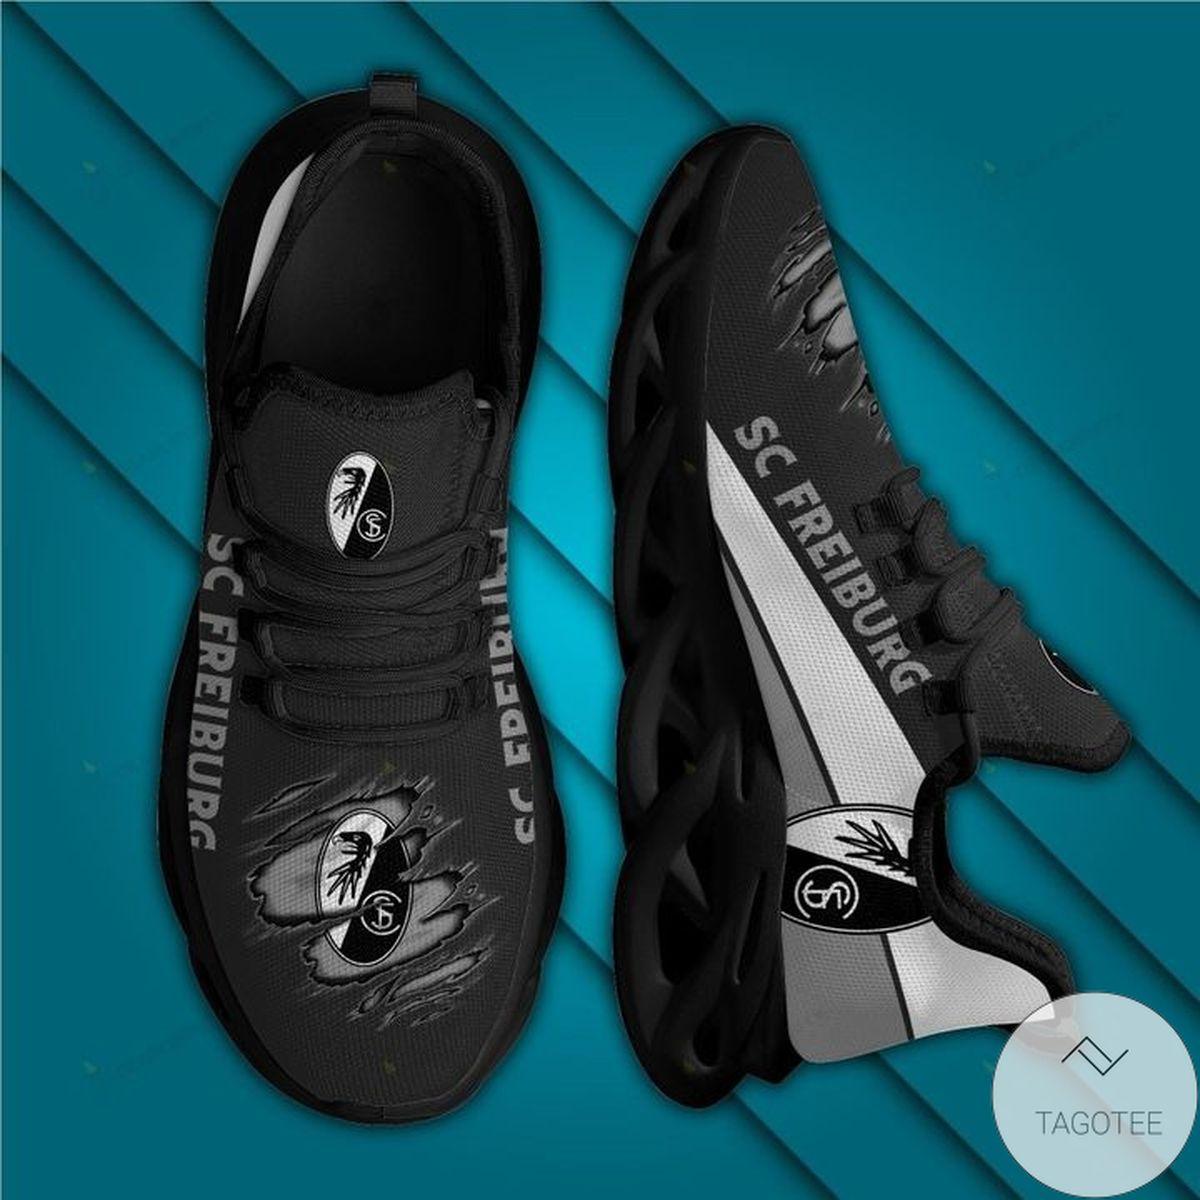 Bundesliga SC Freiburg Max Soul Shoes z